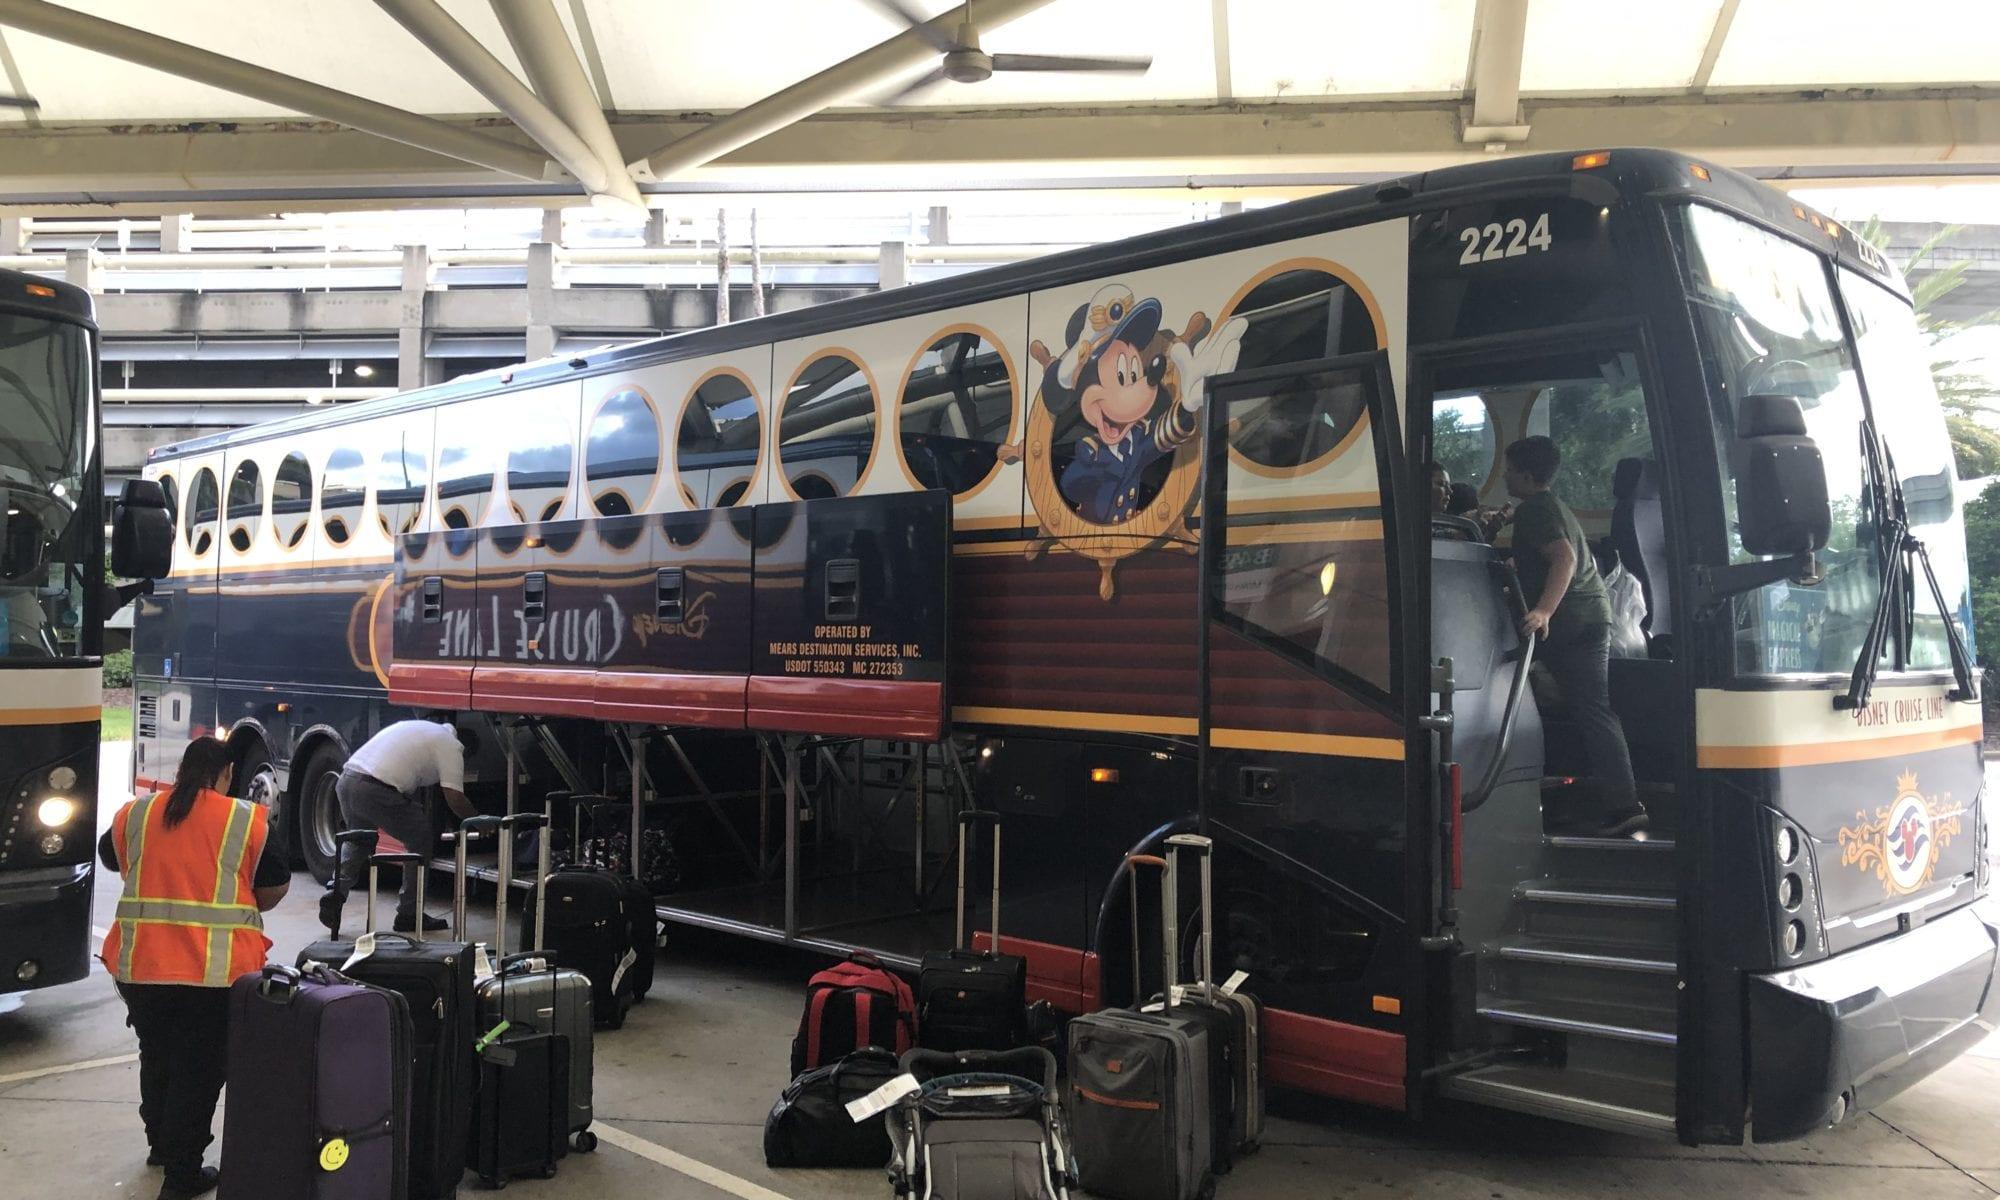 Magical Express bus at Orlando airport, Florida, heading to our resort, Pop century, Disney World